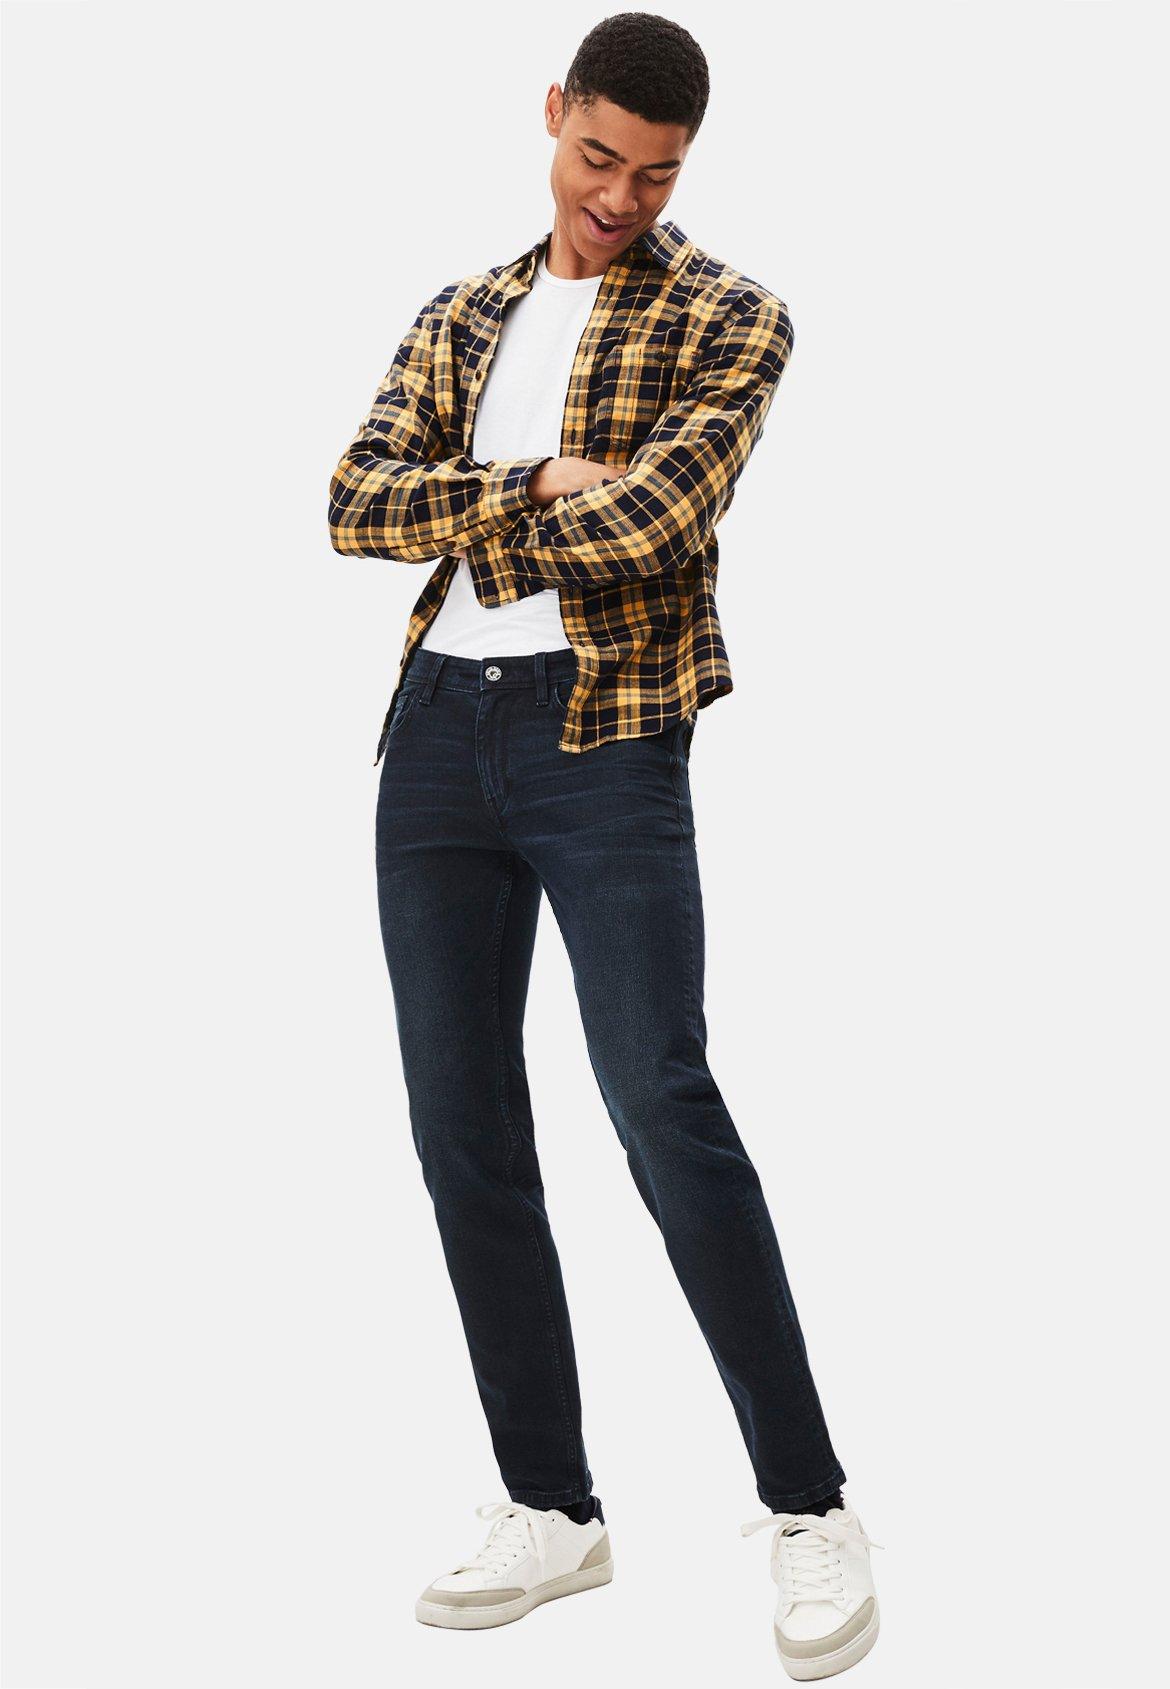 Celio Jeans Slim Fit - Navy Blue